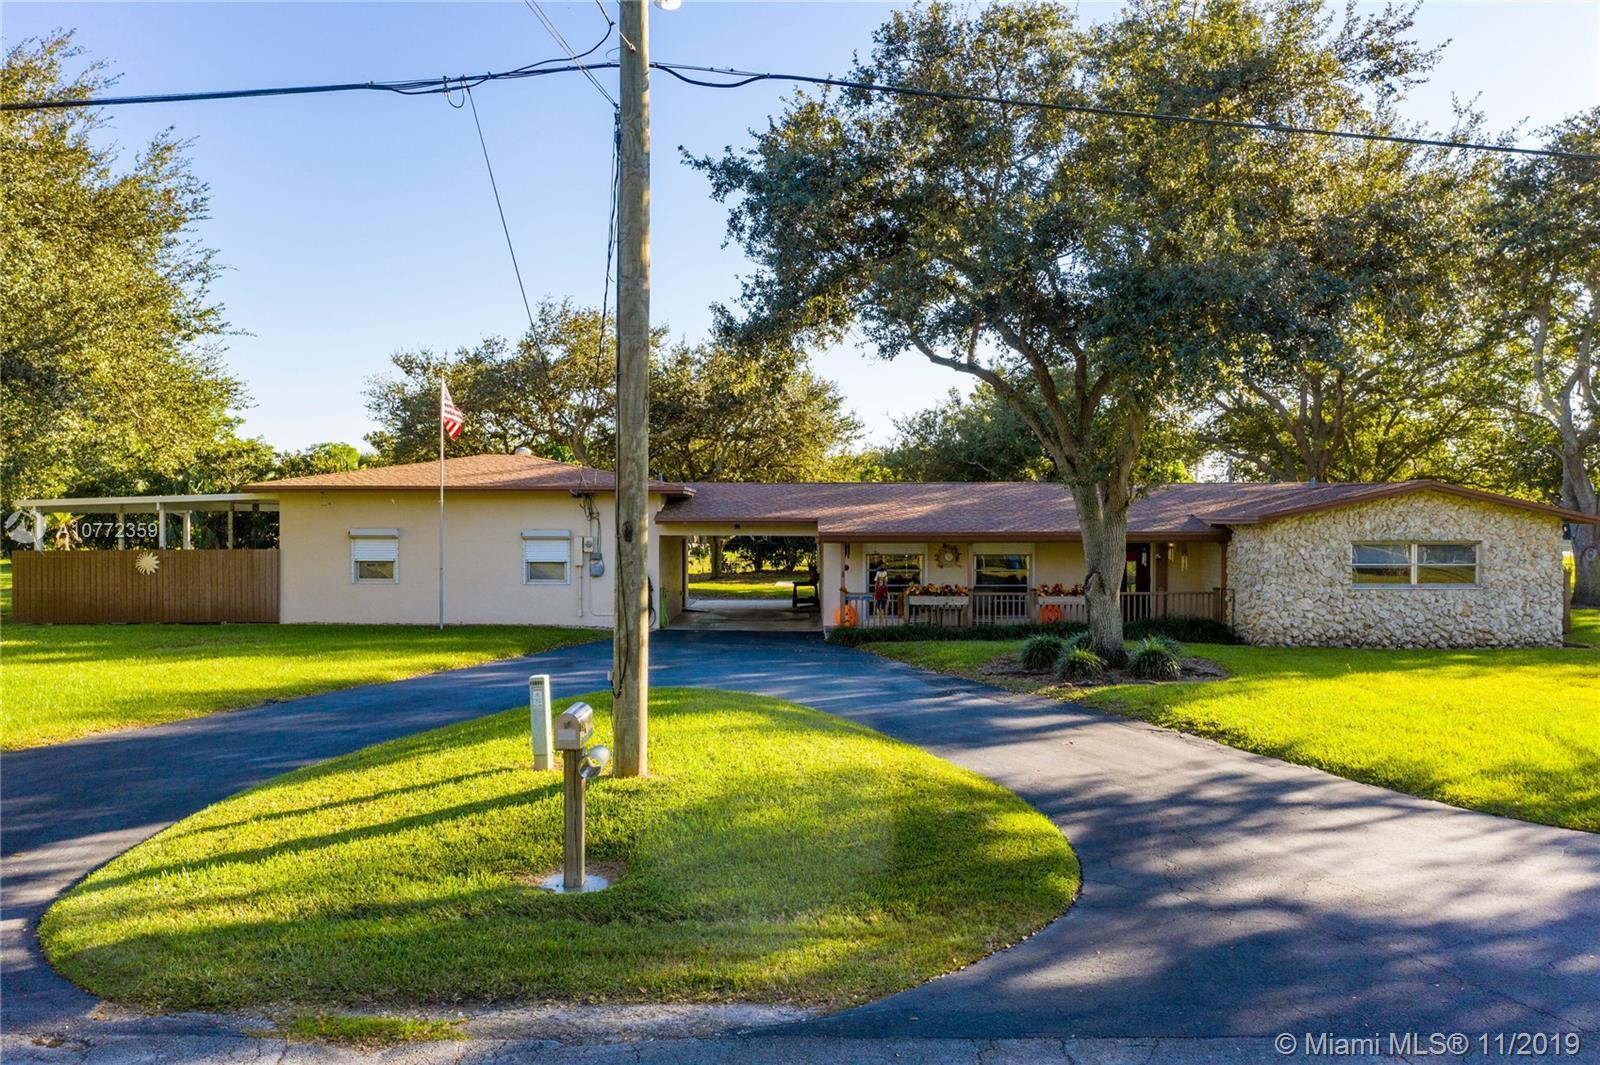 19600 SW 308th St, Homestead, FL 33030 - Homestead, FL real estate listing